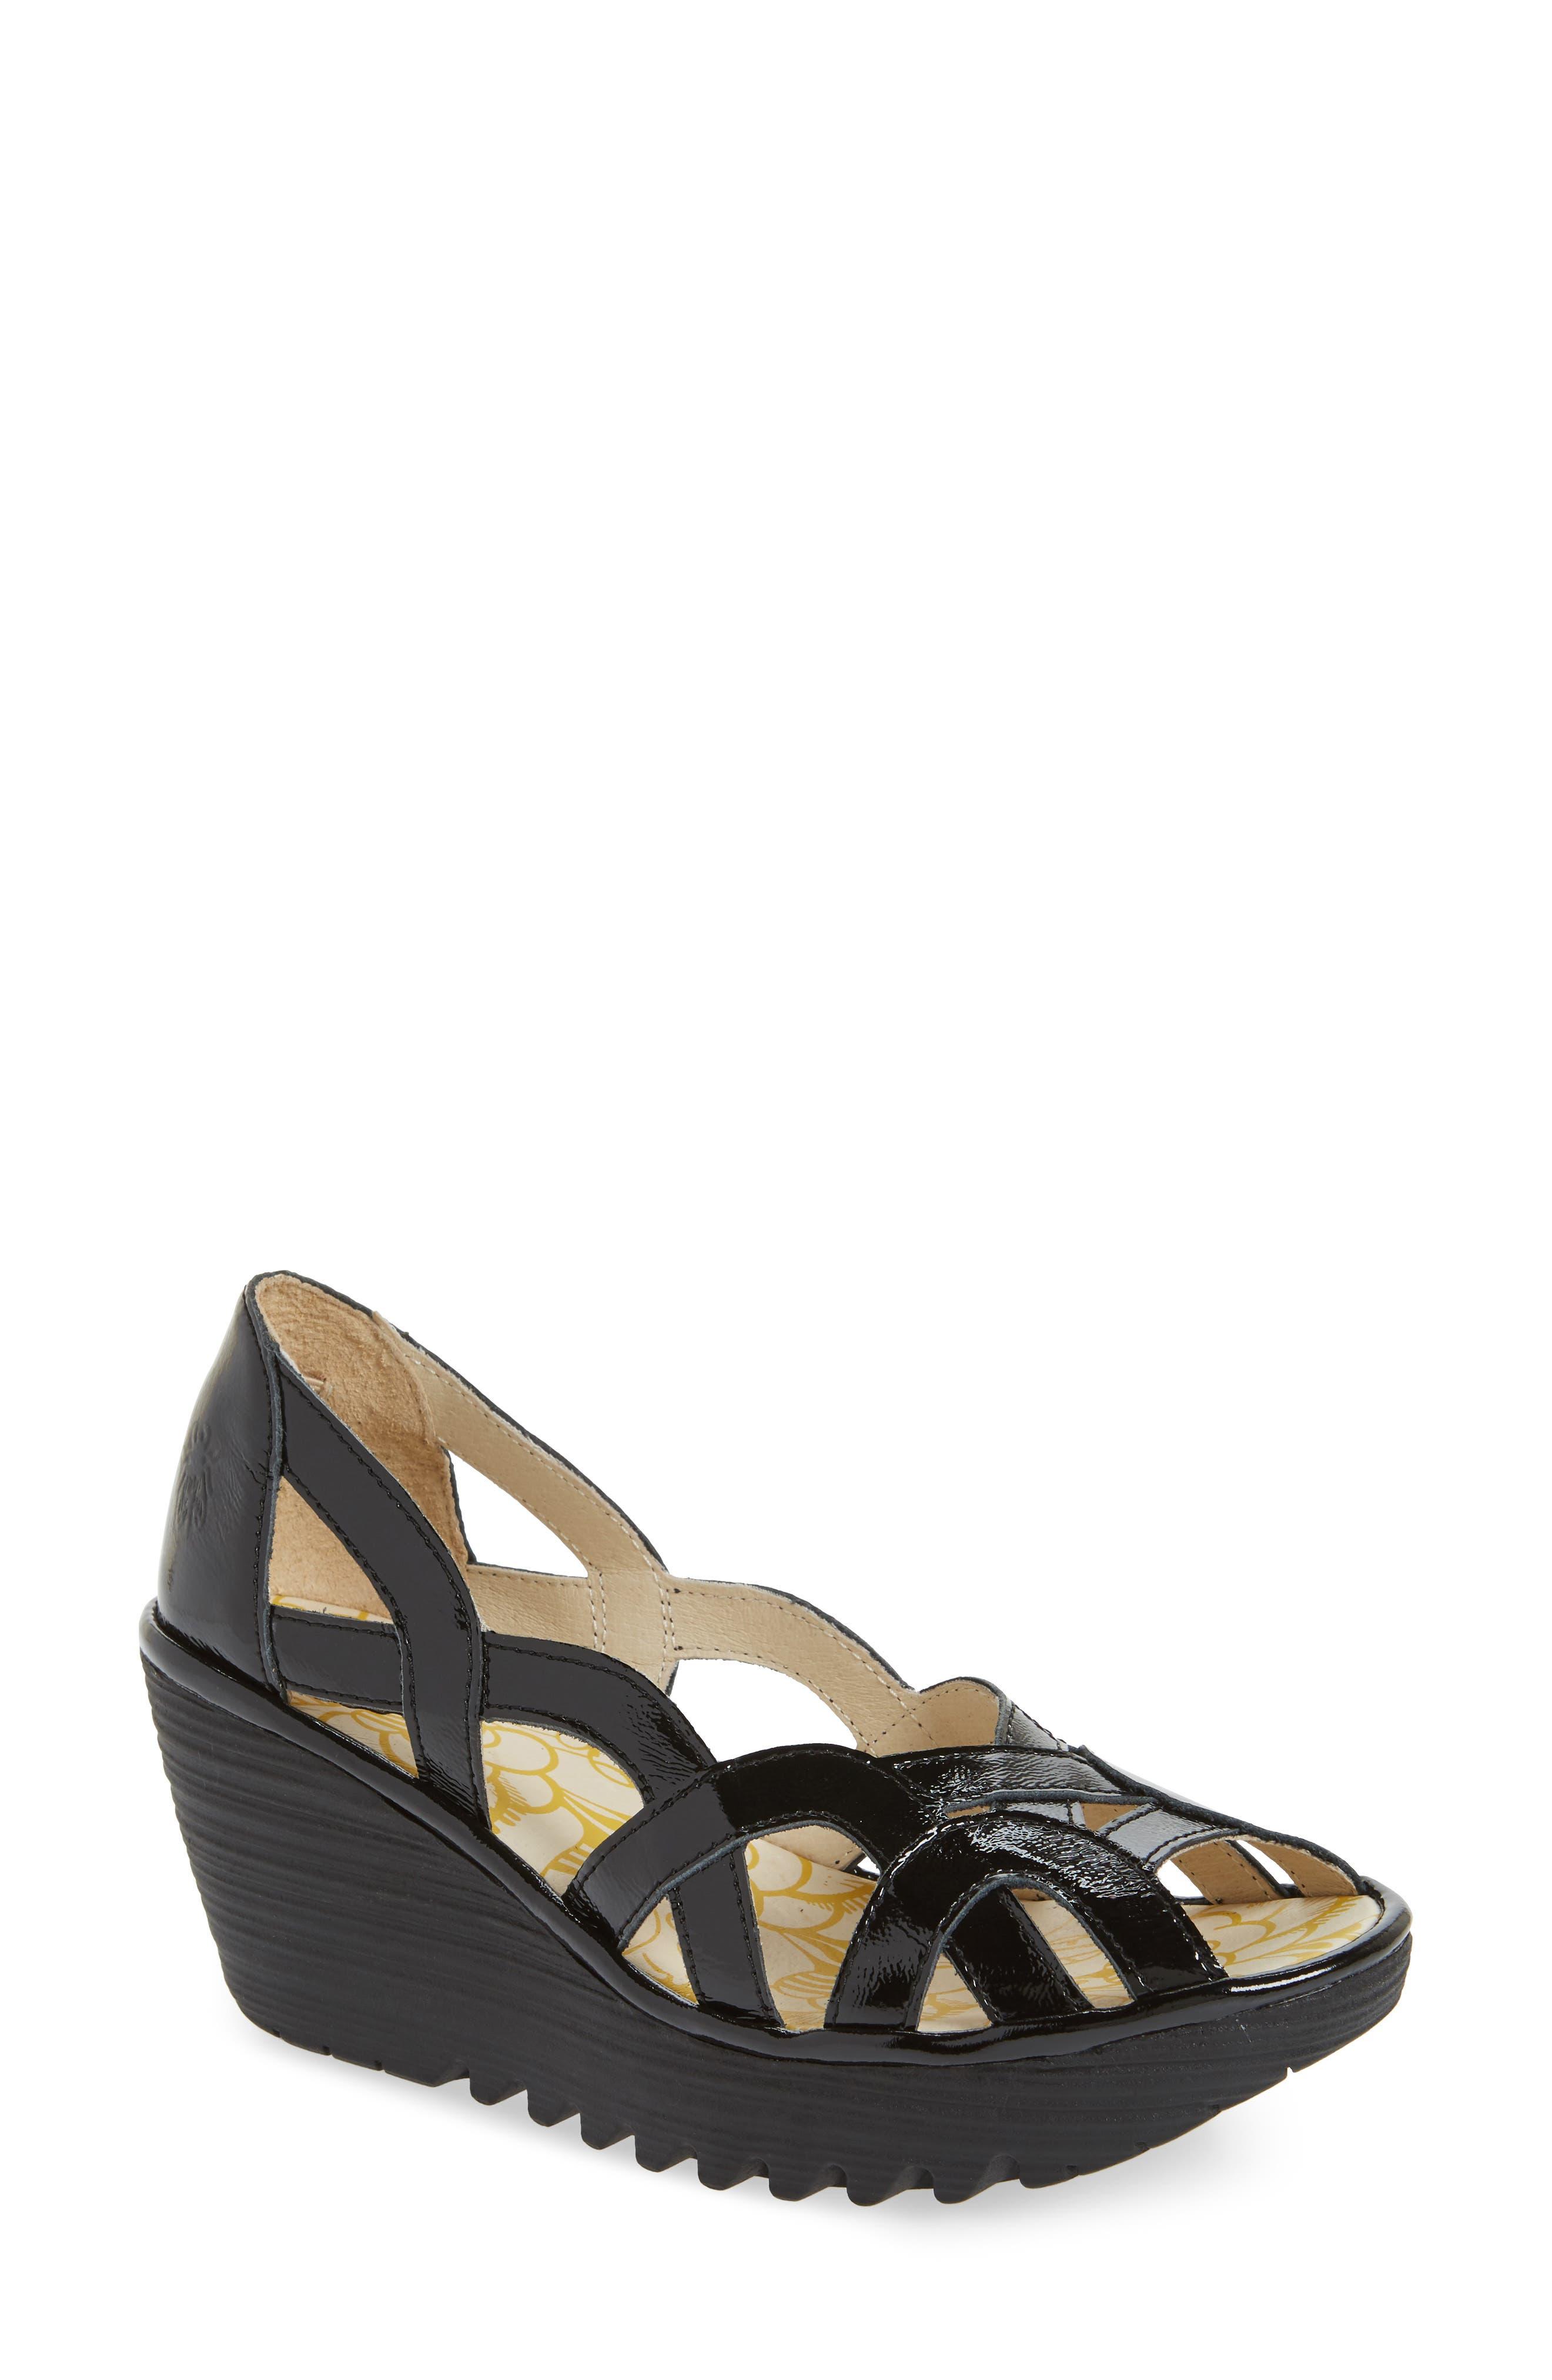 Yadi Wedge Sandal,                         Main,                         color, BLACK LUXOR LEATHER